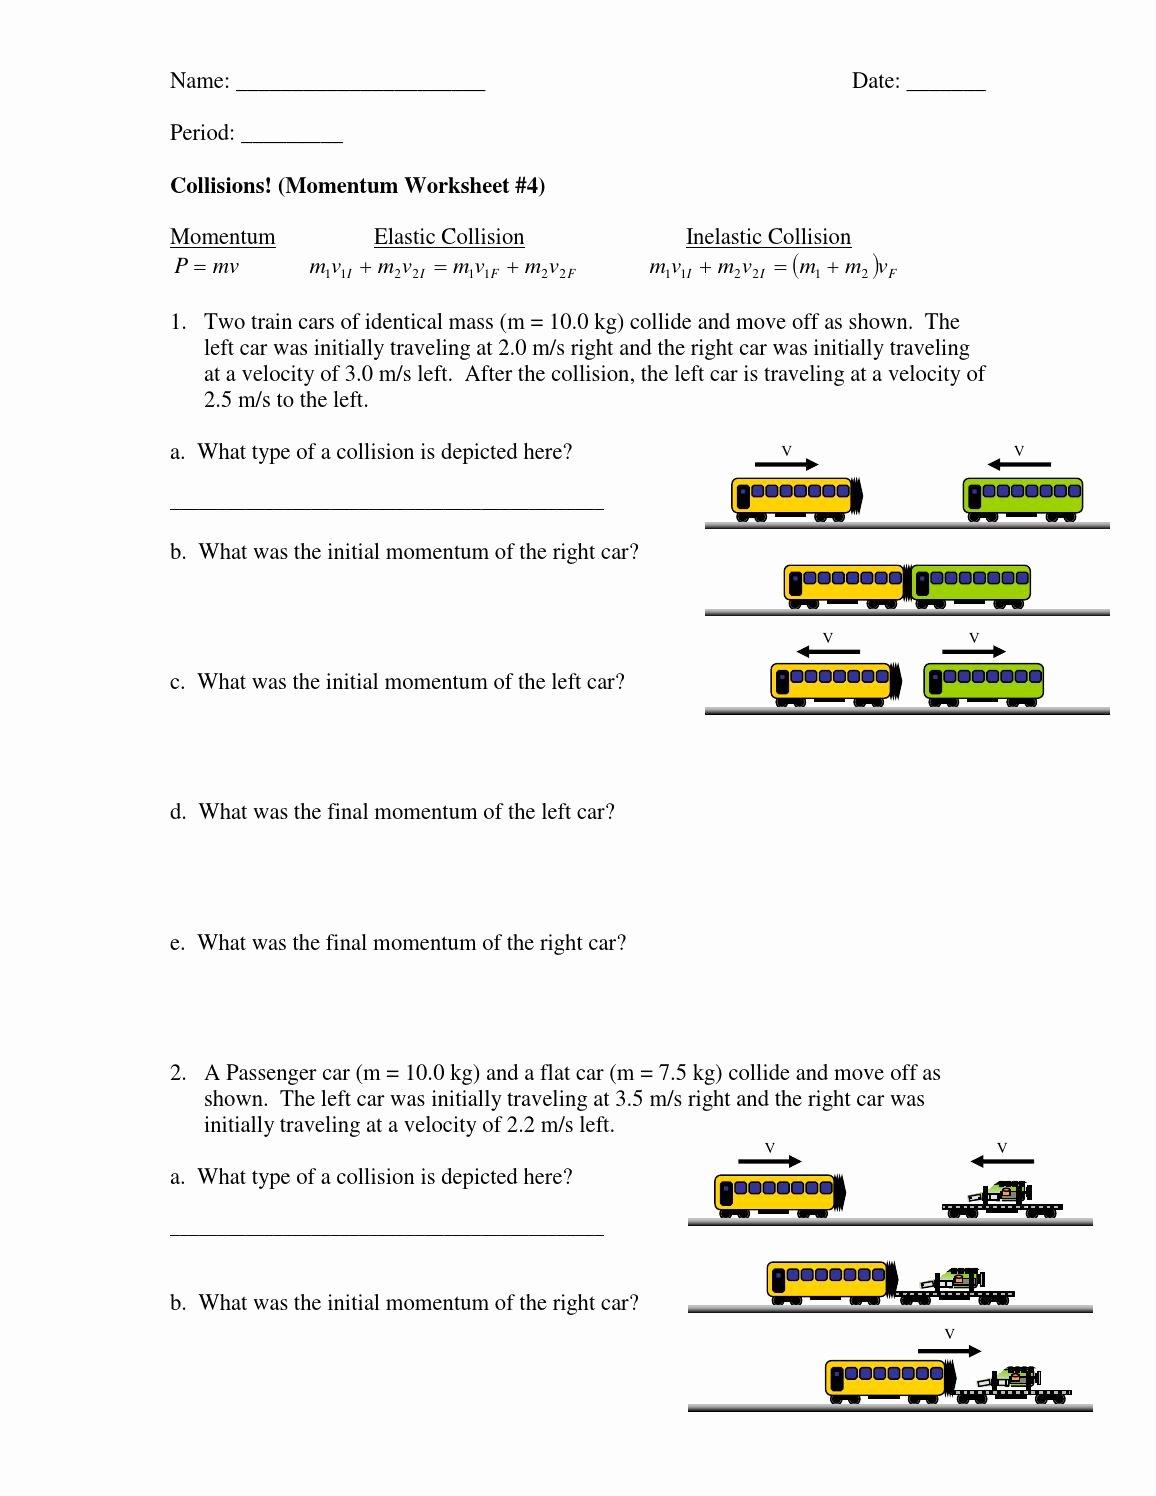 50 Momentum Worksheet Answer Key